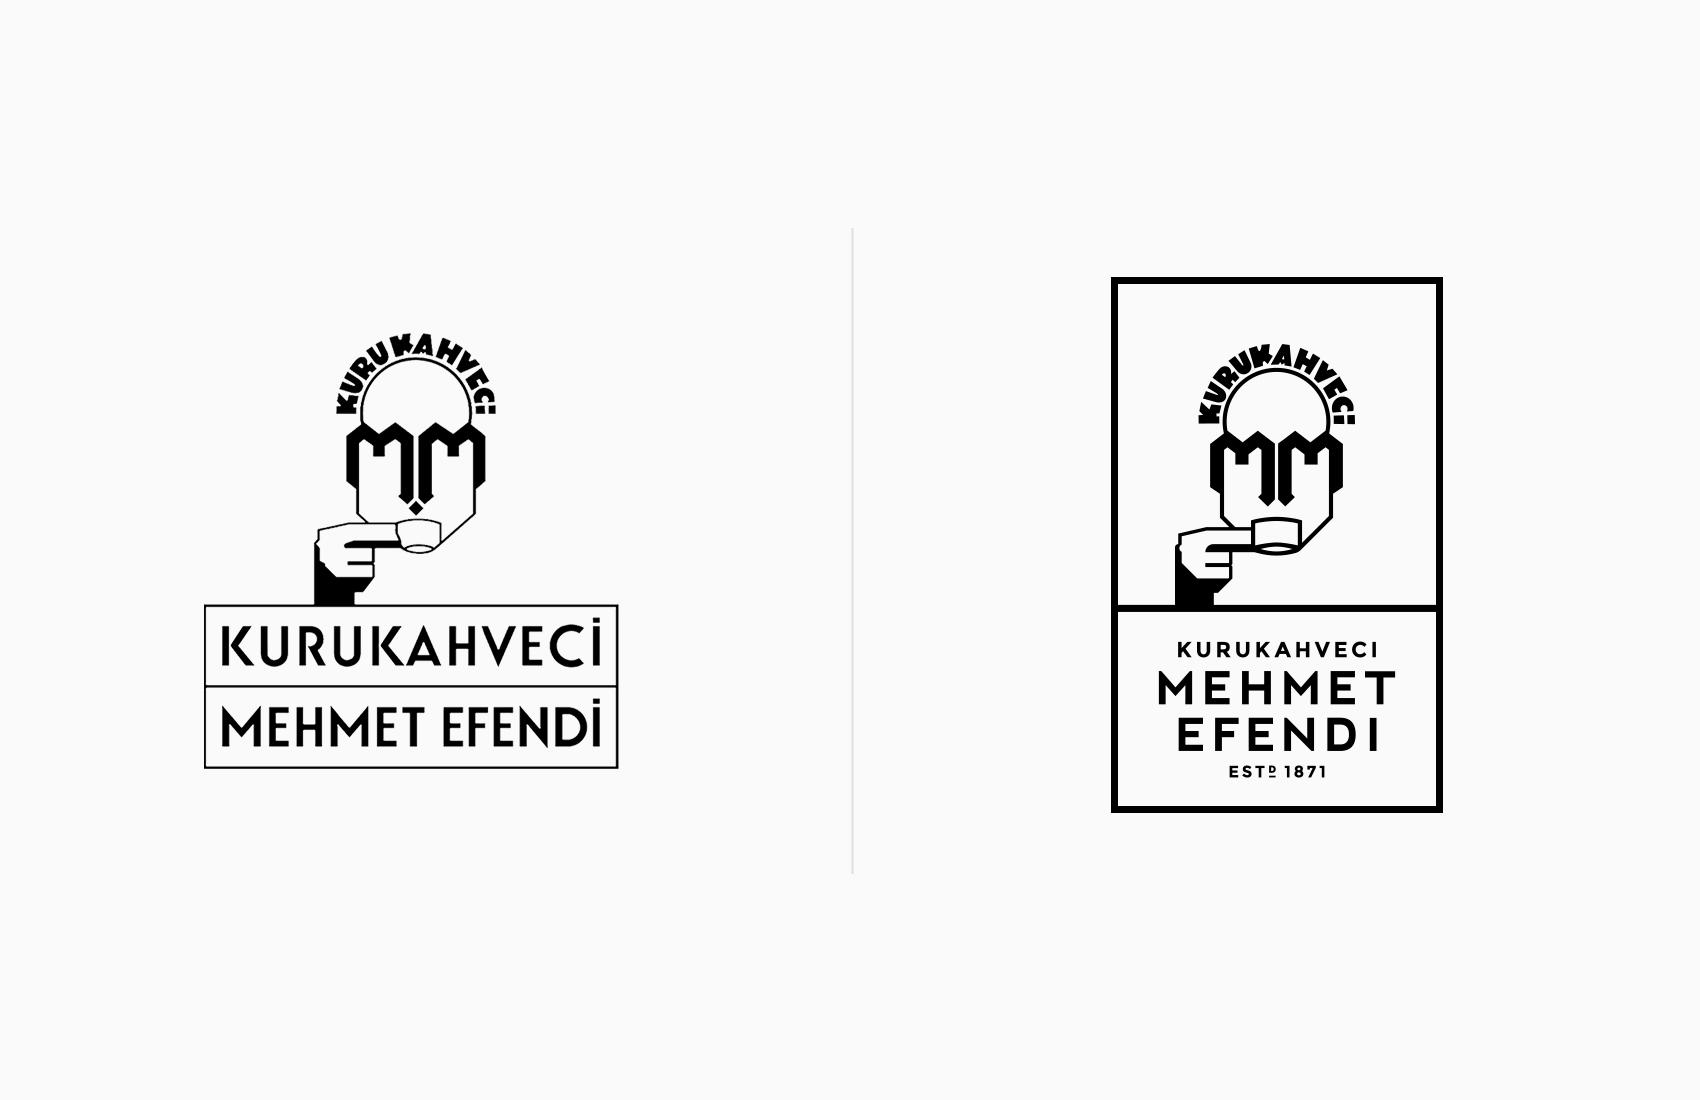 emretelli_kurukahvecimehmetefendi_logo-comparison_1700